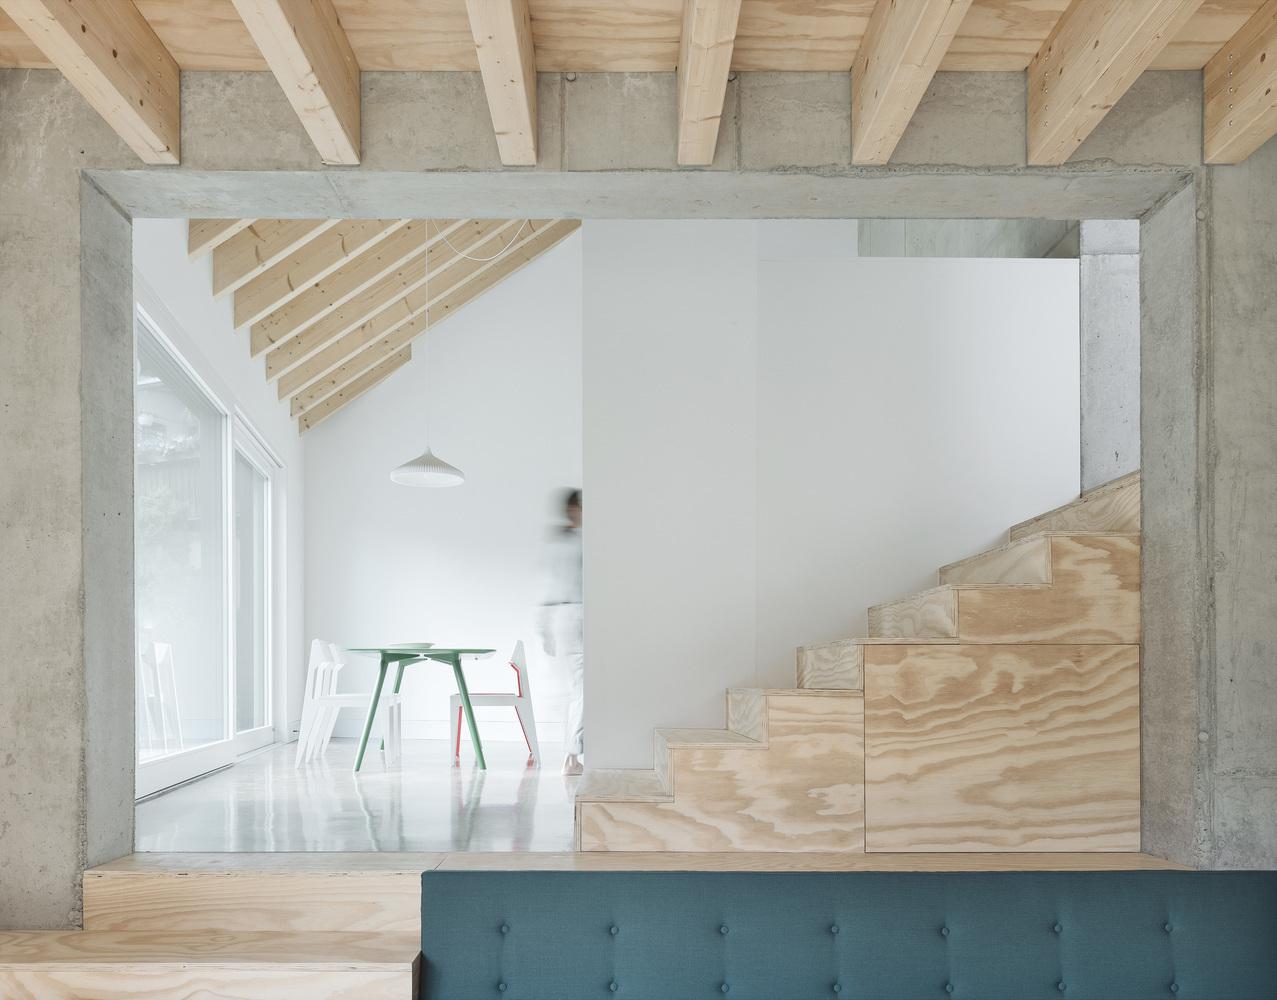 Tendencias en Diseño de Interiores 2020: Biofilia, Chubby y Fluidez,Haus D / Yonder – Architektur und Design © Brigida González